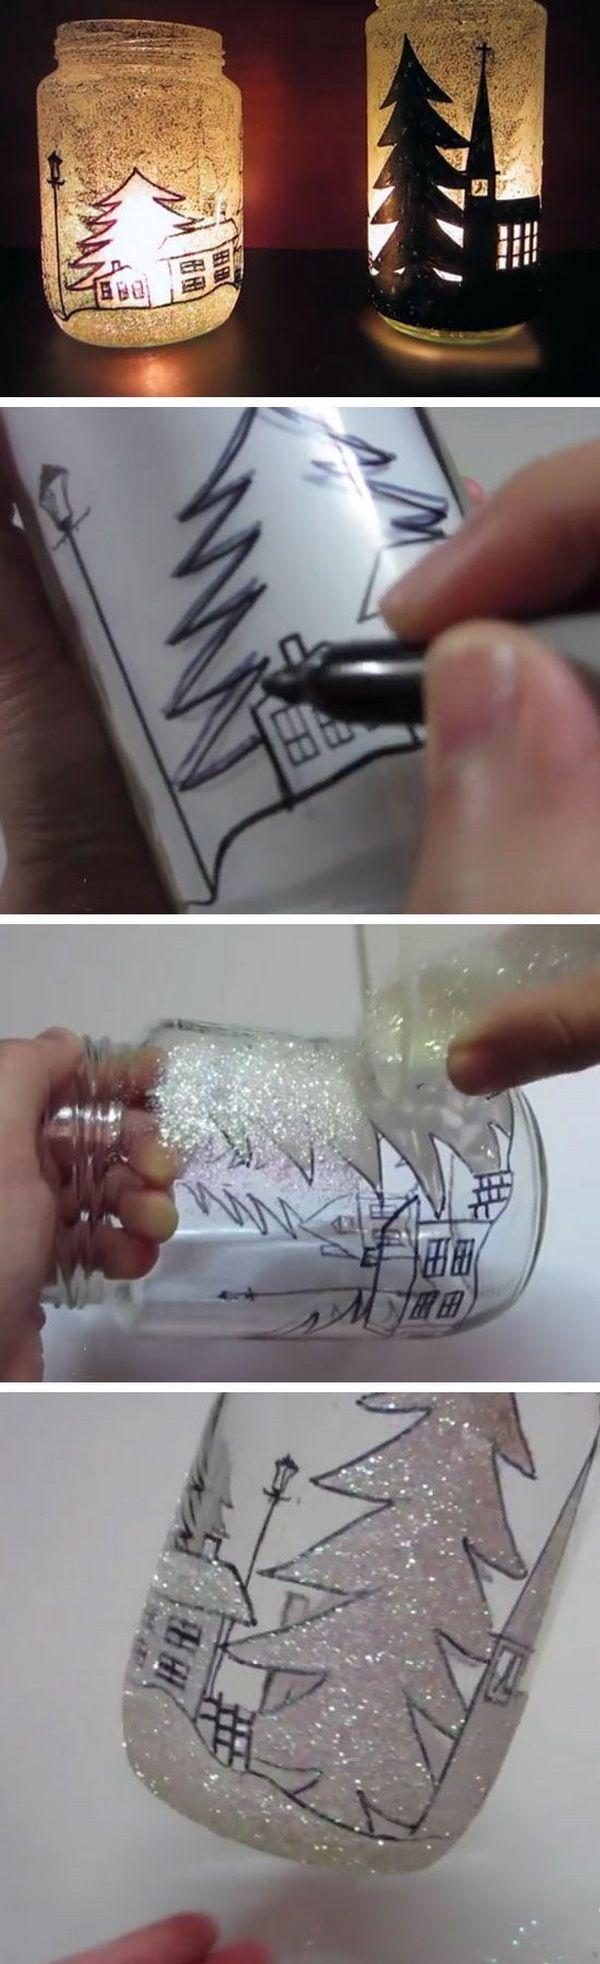 DIY Glittery Christmas Tree Lanterns.